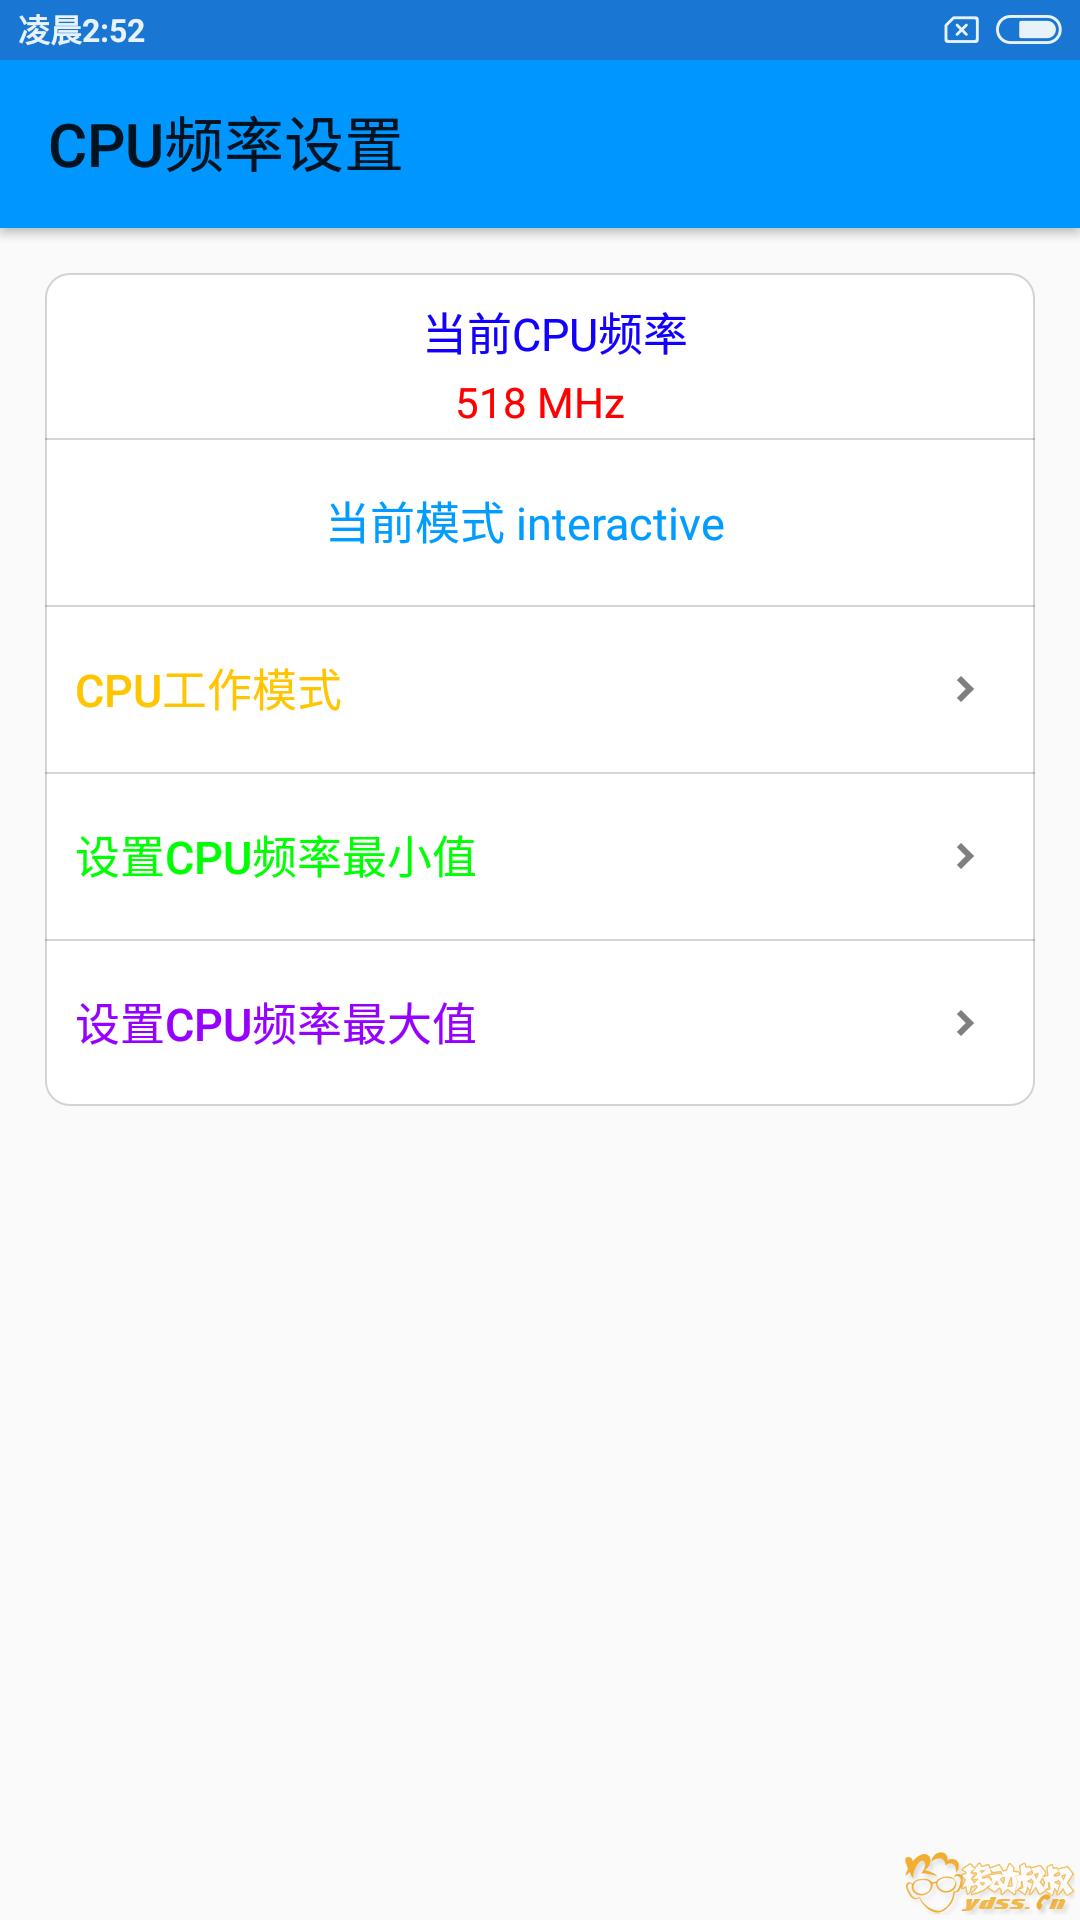 Screenshot_1971-01-03-02-52-25-813_com.zhanhong.tools.png